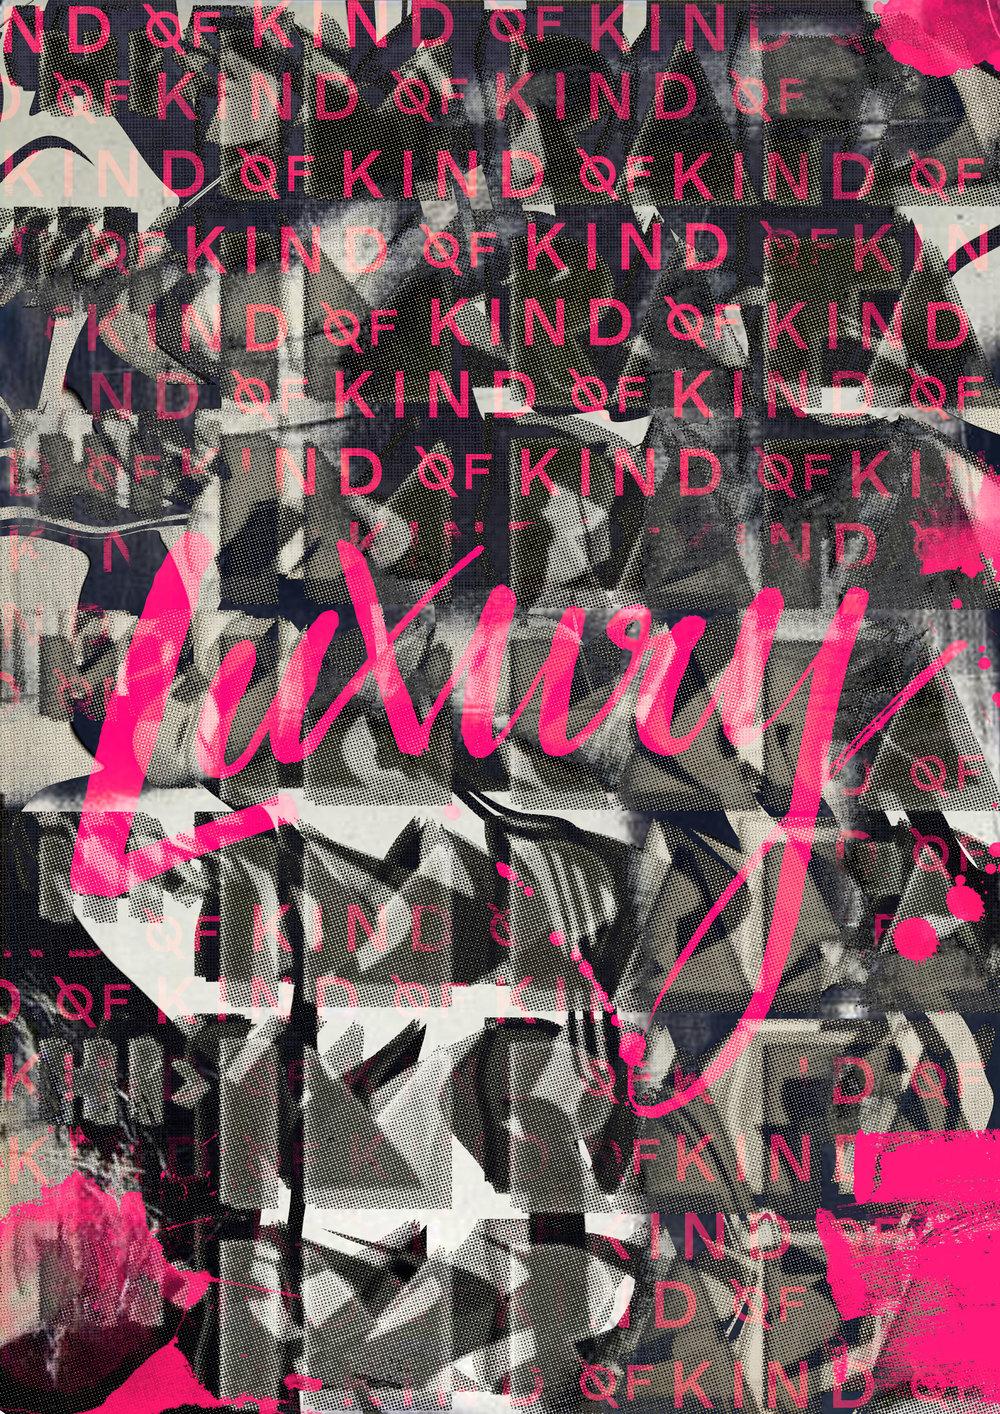 KIND_OF_LUXURY_LETRA_05.jpg